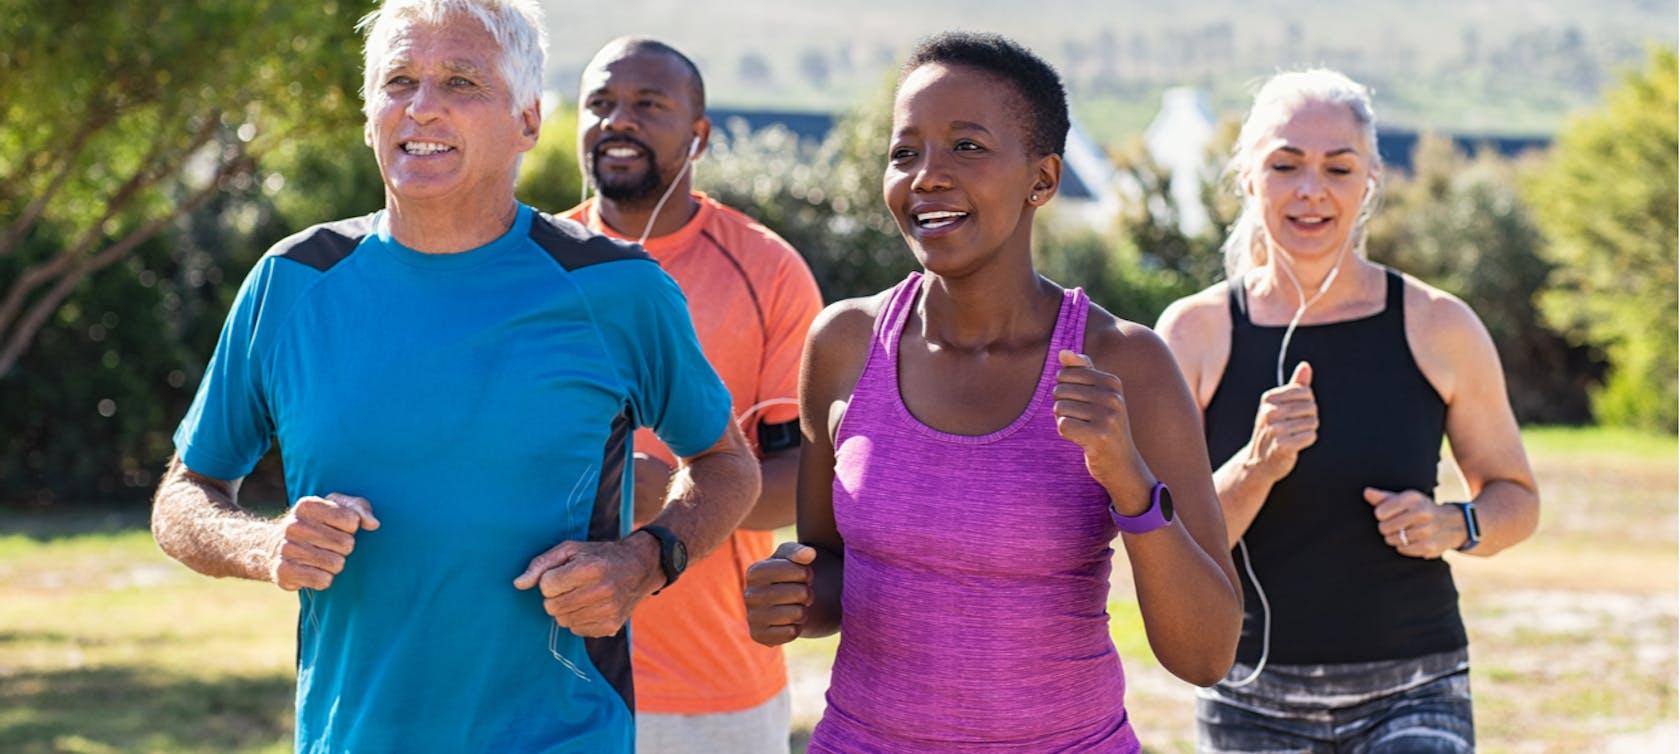 Keto Exercise Part 3: Endurance Training On Keto